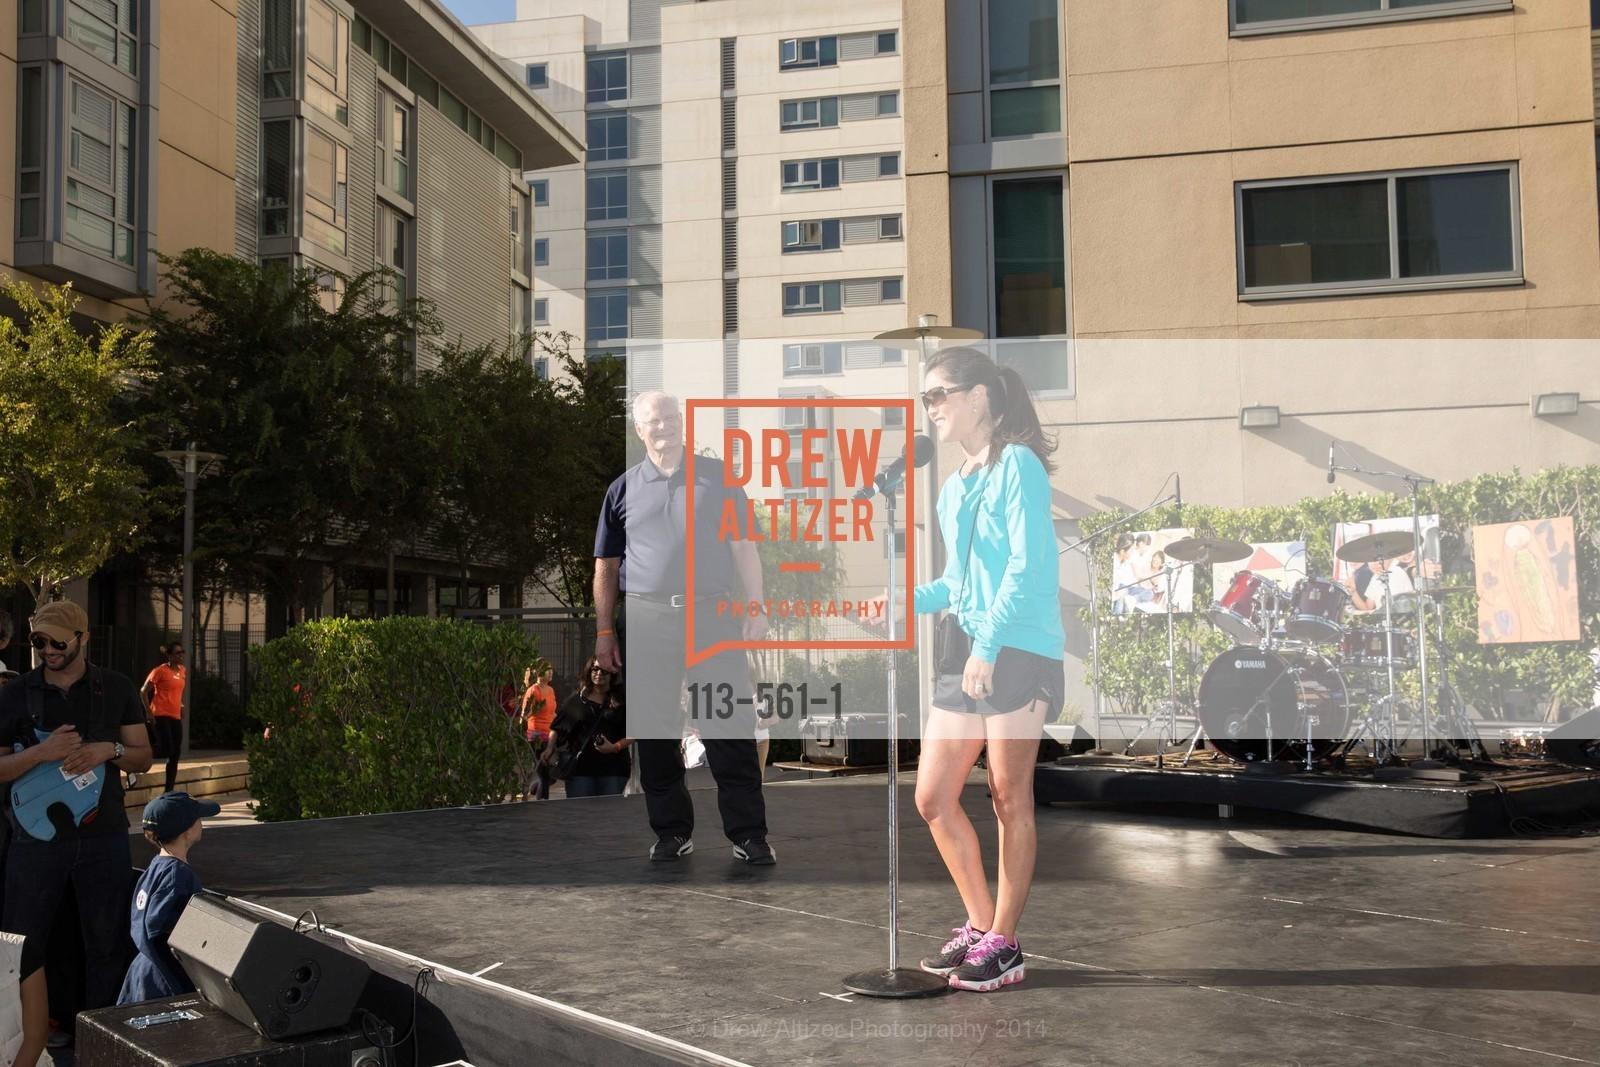 Mark Laret, Kristi Yamaguchi, UCSF Medical Center HARD HAT WALK & LIGHTS ON FESTIVAL, US, September 6th, 2014,Drew Altizer, Drew Altizer Photography, full-service event agency, private events, San Francisco photographer, photographer California